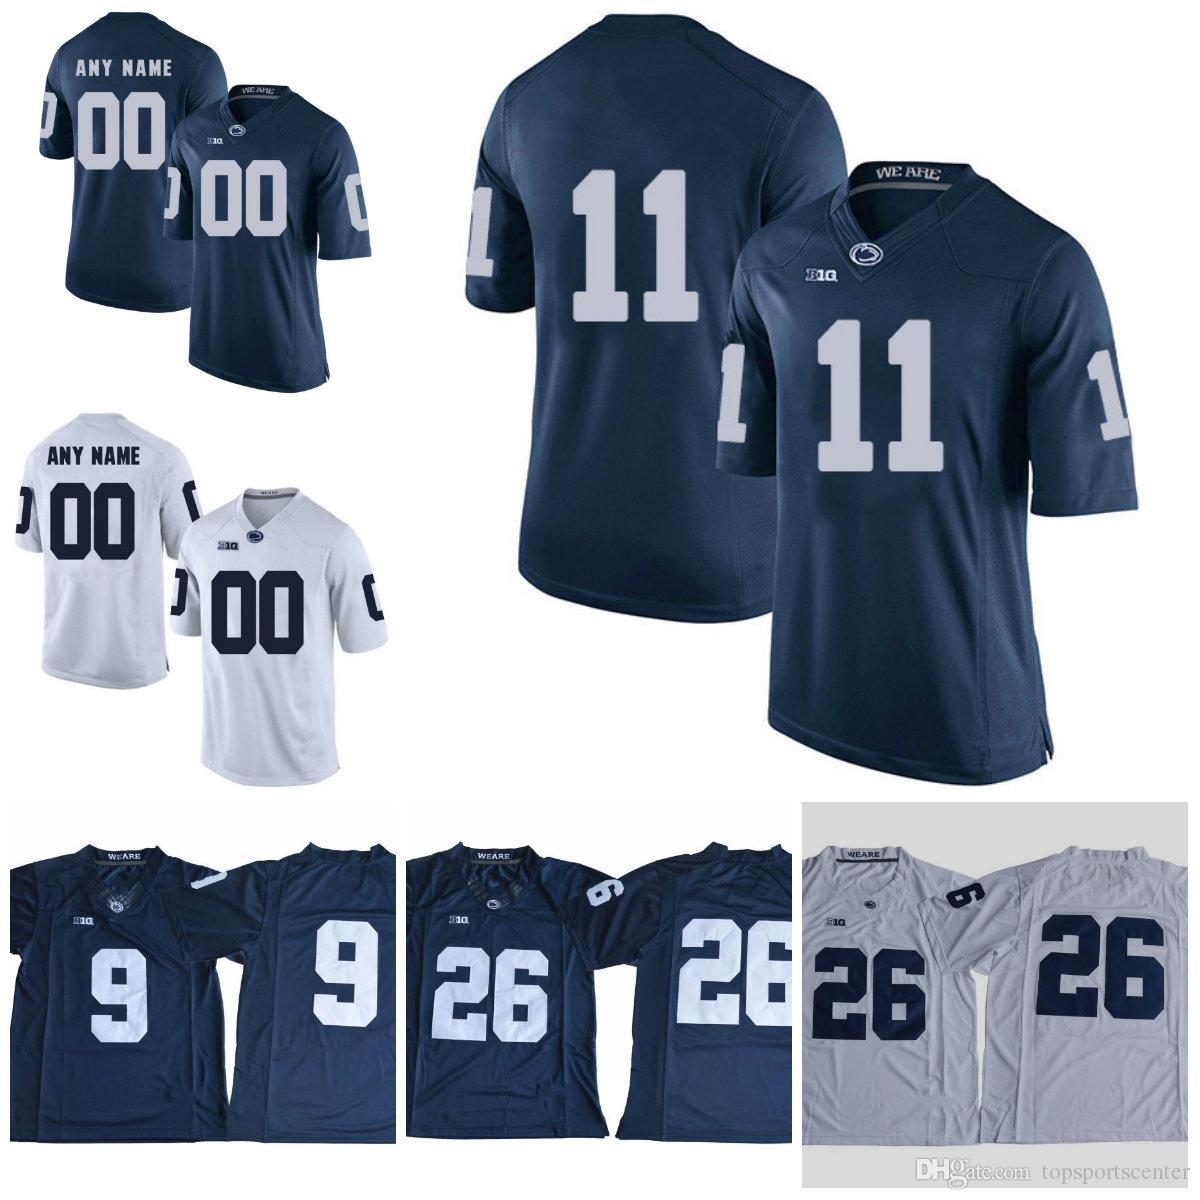 save off d321a c5504 Custom Penn State Nittany Lions #11 Micah Parsons no name Jersey 1 KJ  Hamler 26 Barkley McSorley 2 Marcus Allen PSU Navy Blue White Jersey